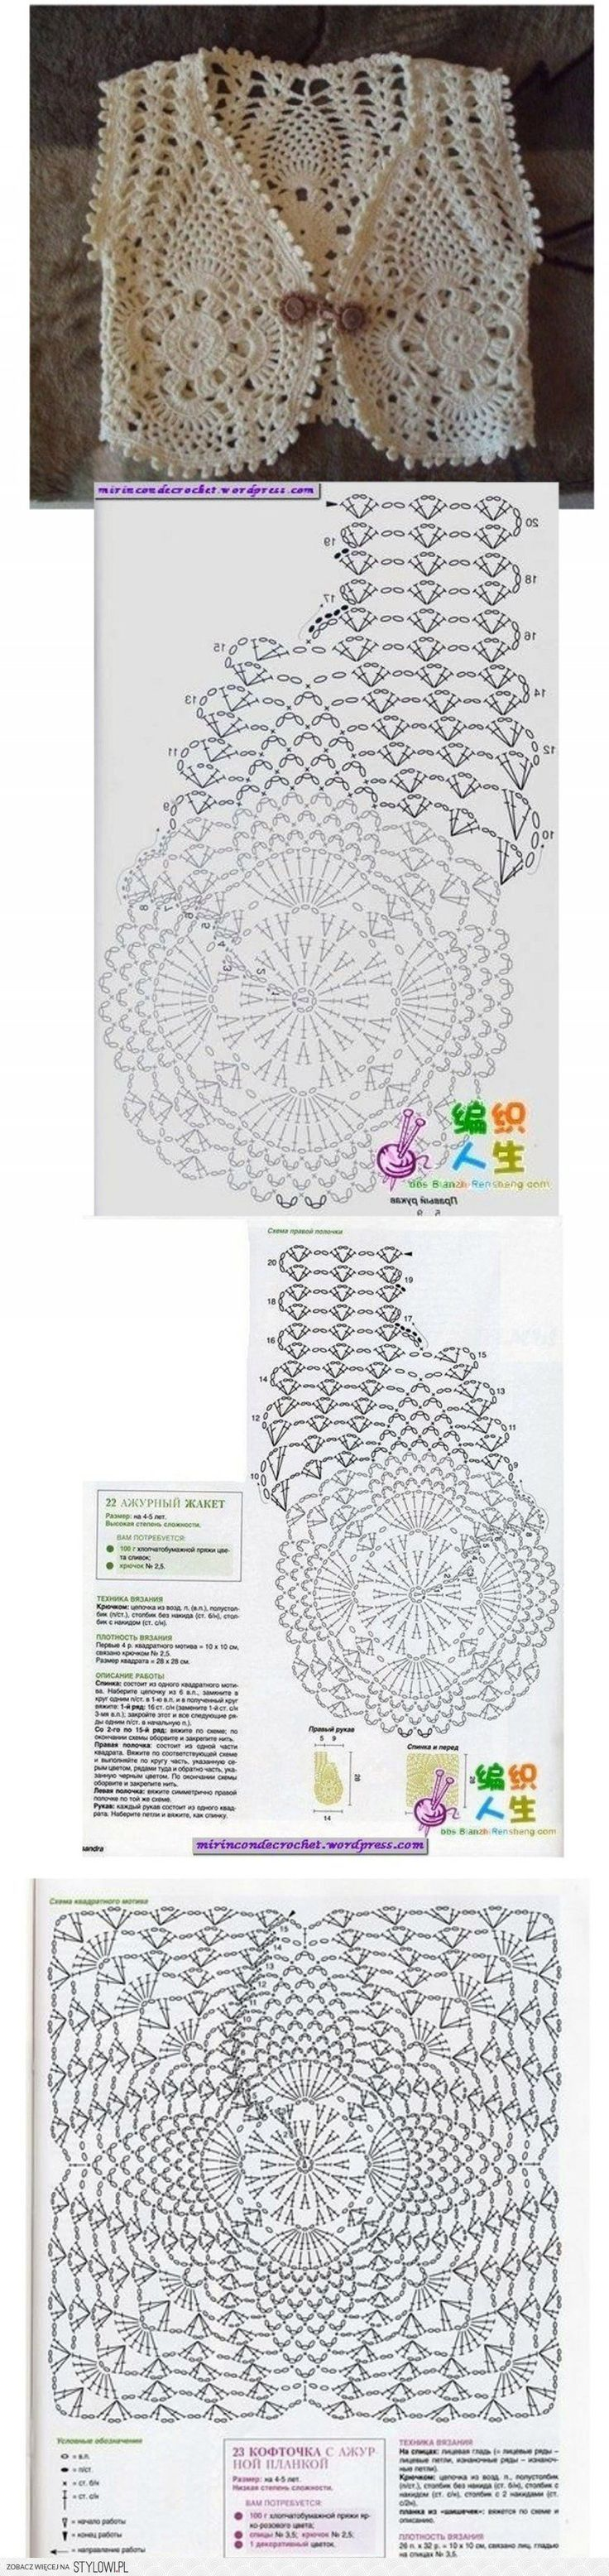 "chaleco crochet [   ""crochet - lacy pineapple bolero with charts"",   ""Can"